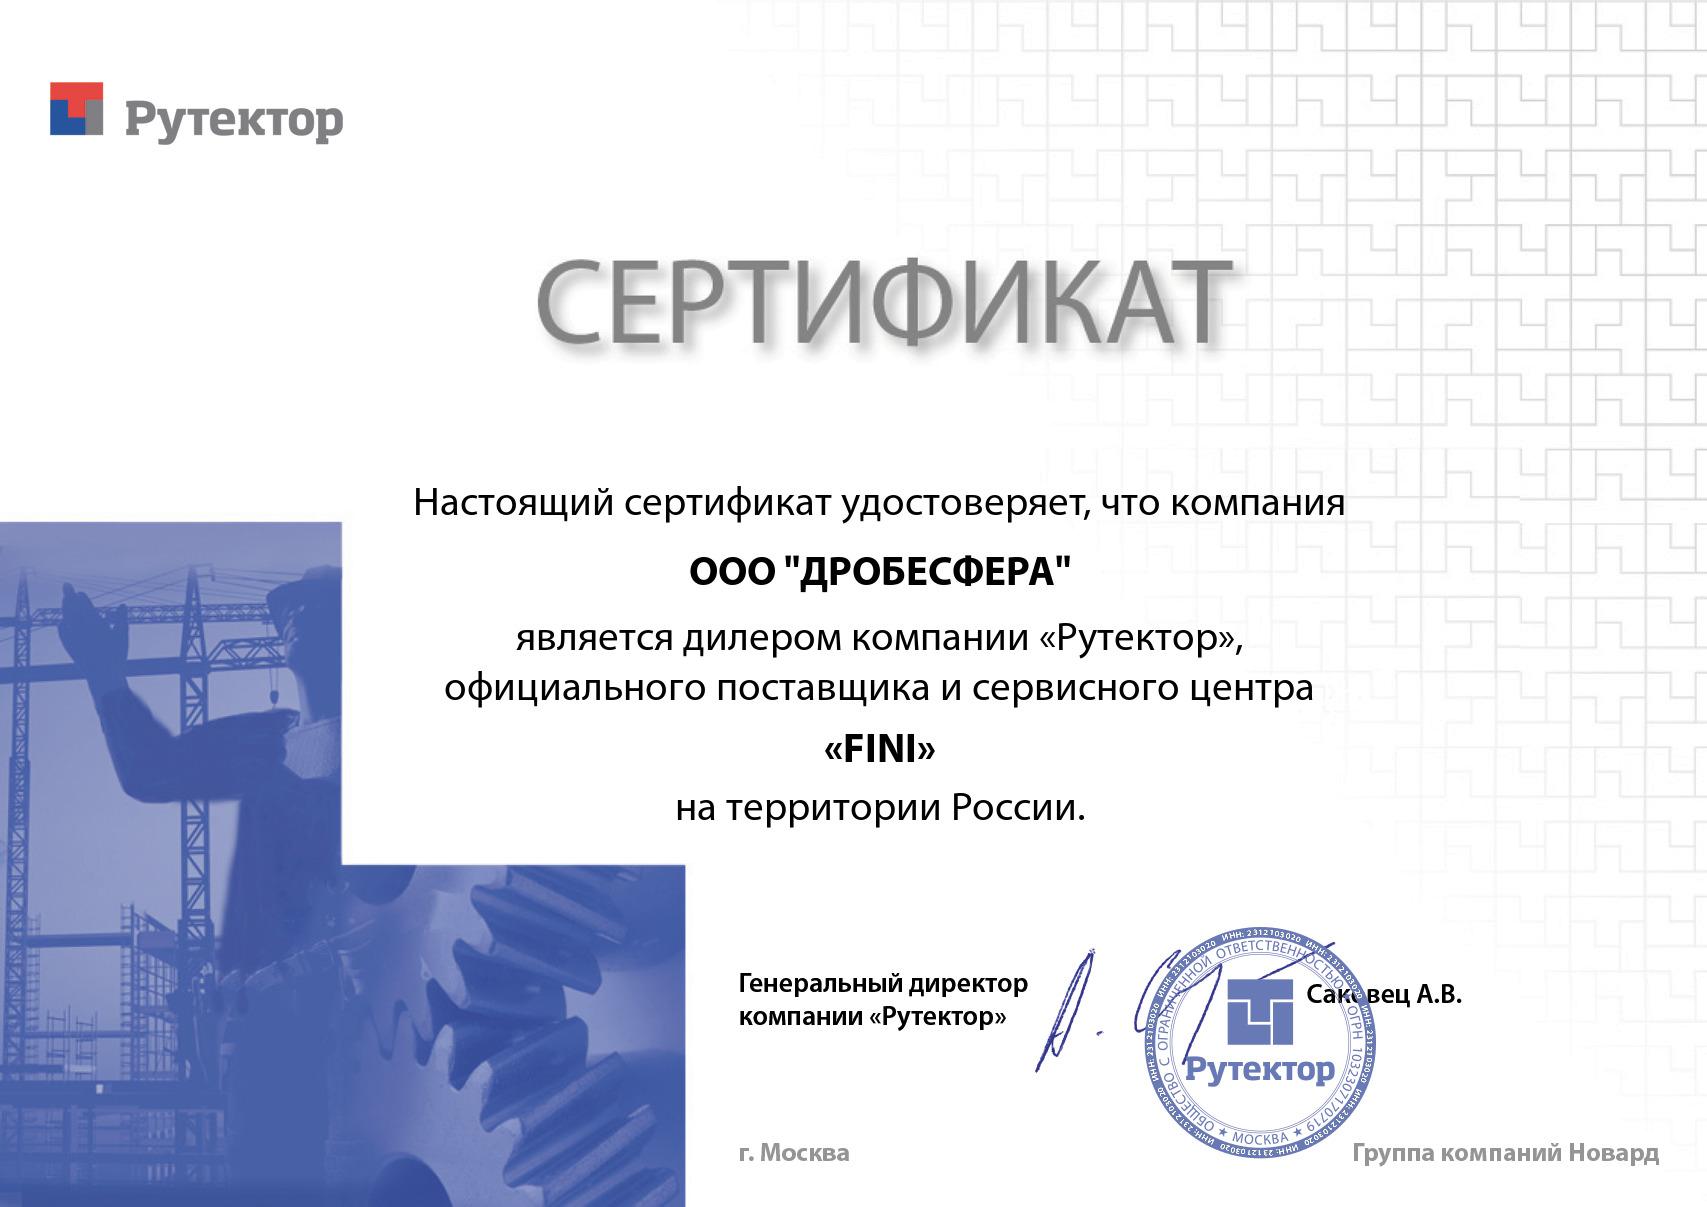 Дилер компании Рутектор по продаже FINI